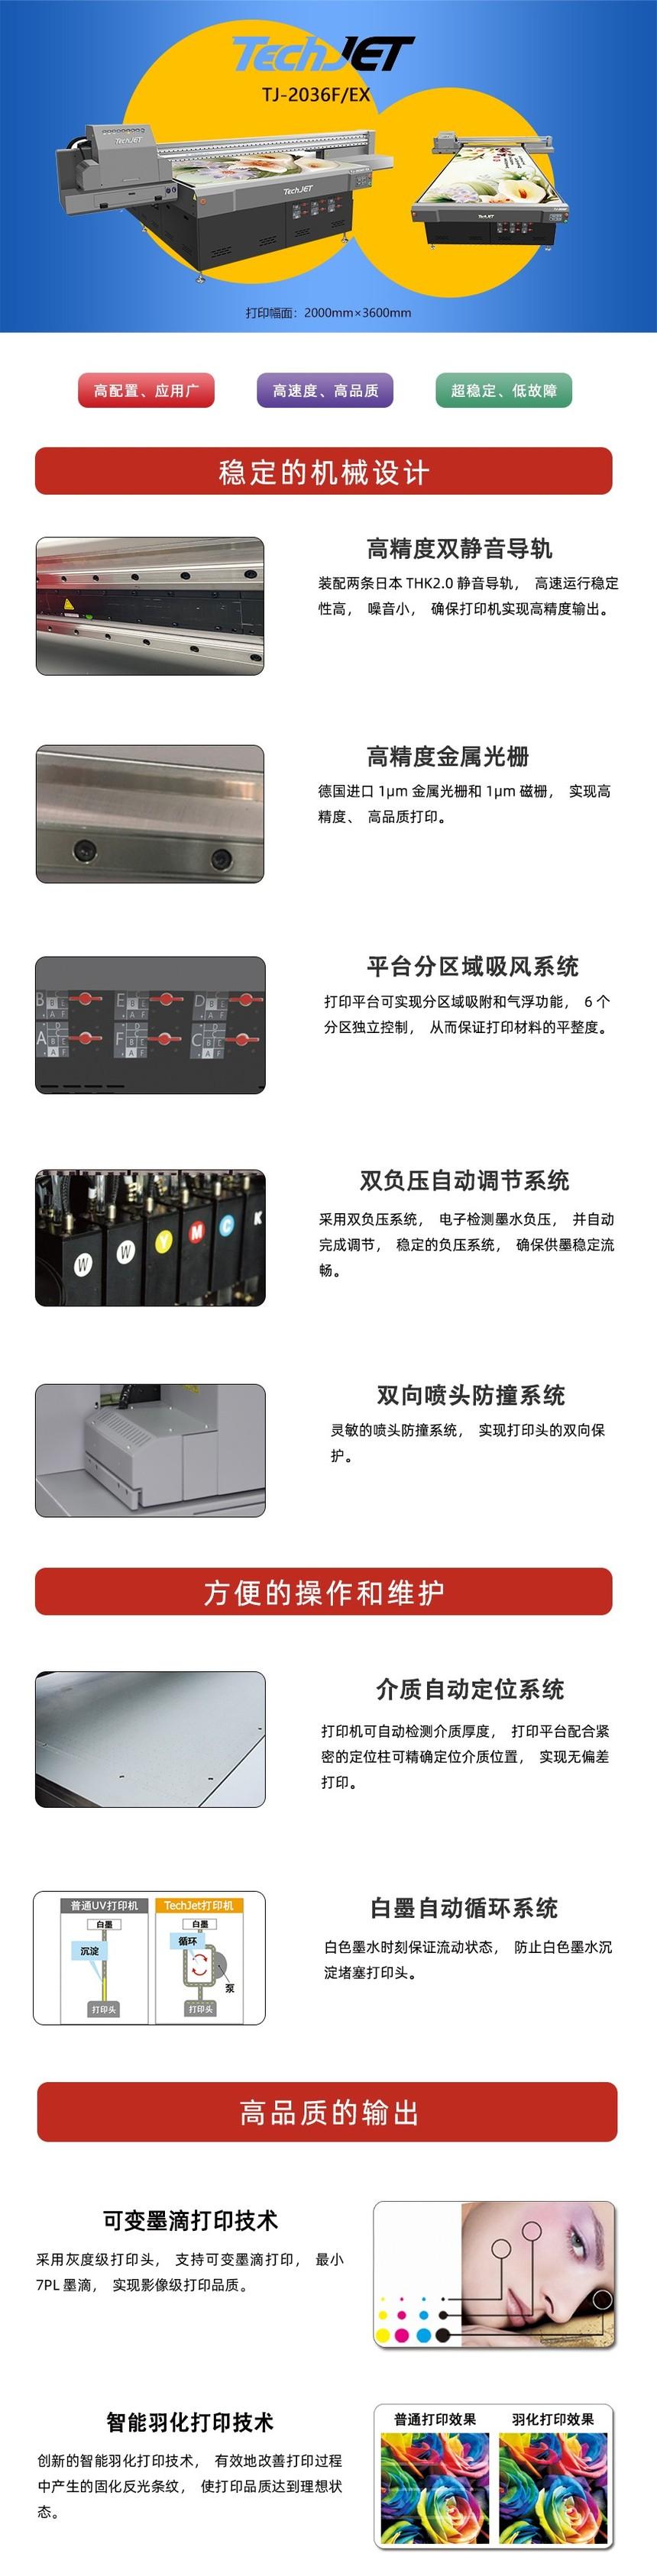 TJ-2036FEX中文产品说明(1).jpg